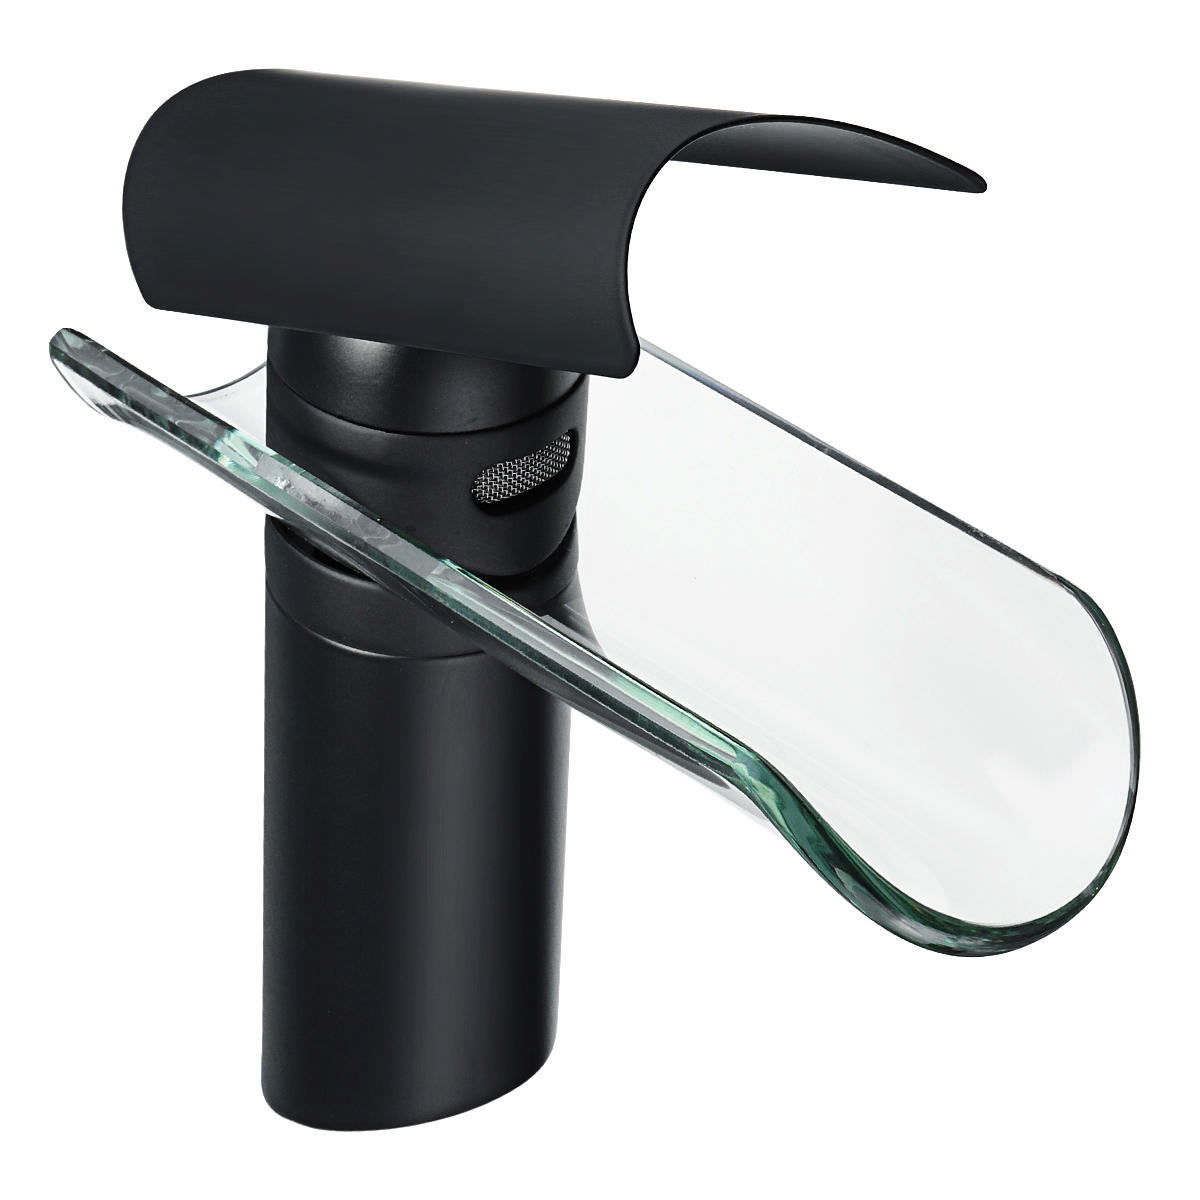 Black Brass Glass Waterfall Faucet Spout Counter Top Basin Mixer Tap Sink Bath